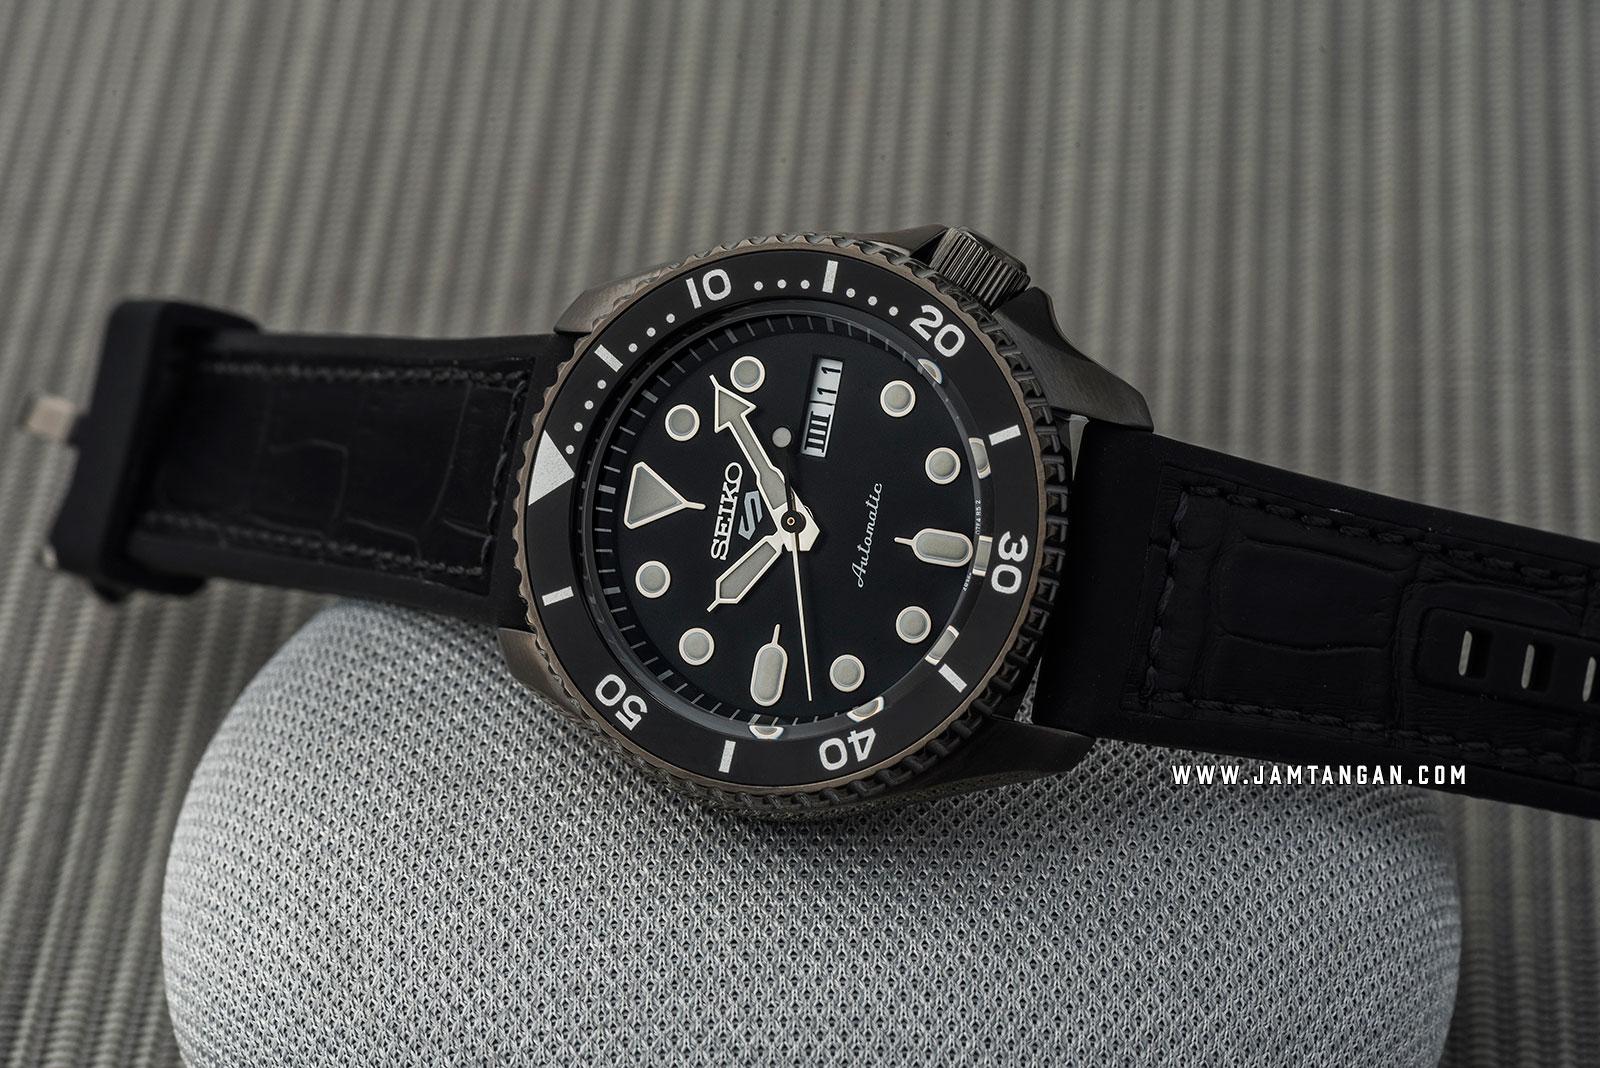 Seiko 5 Sports SRPD65K3 Automatic Black Dial Black Rubber Strap Machtwatch